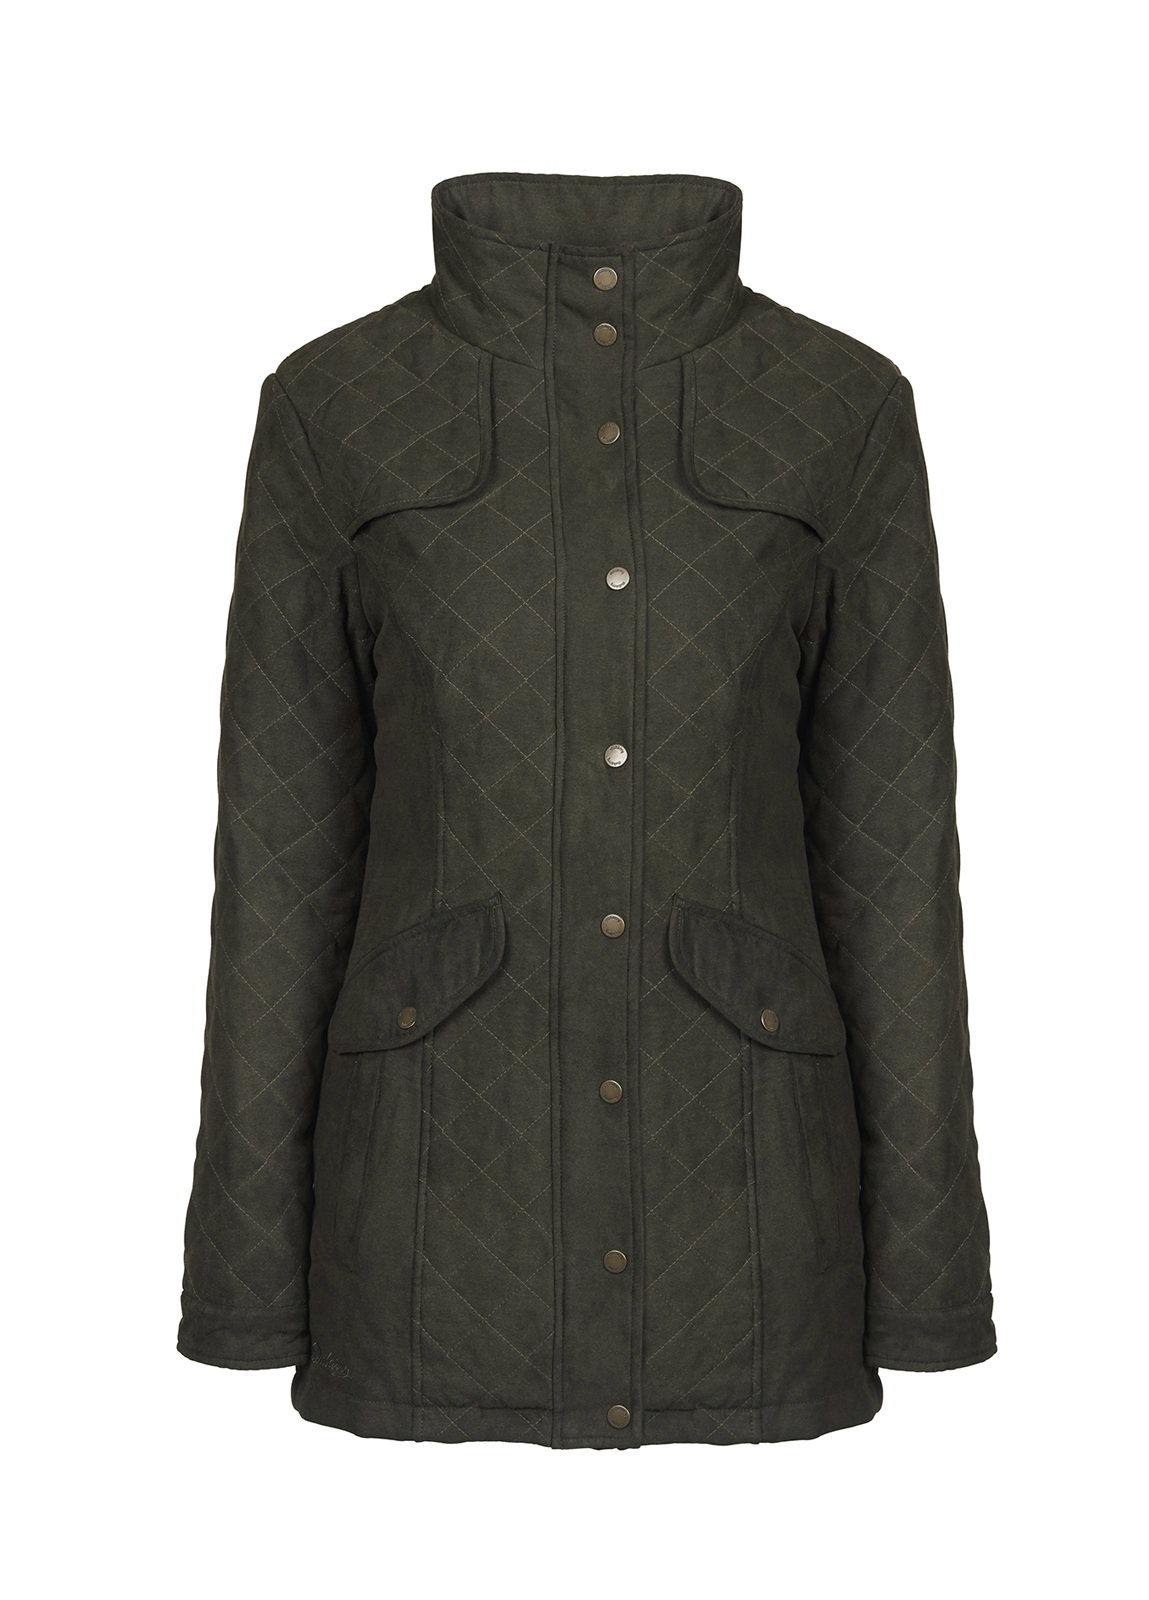 Dubarry_Kanturk Womens Quilted Coat - Verdigris_Image_2